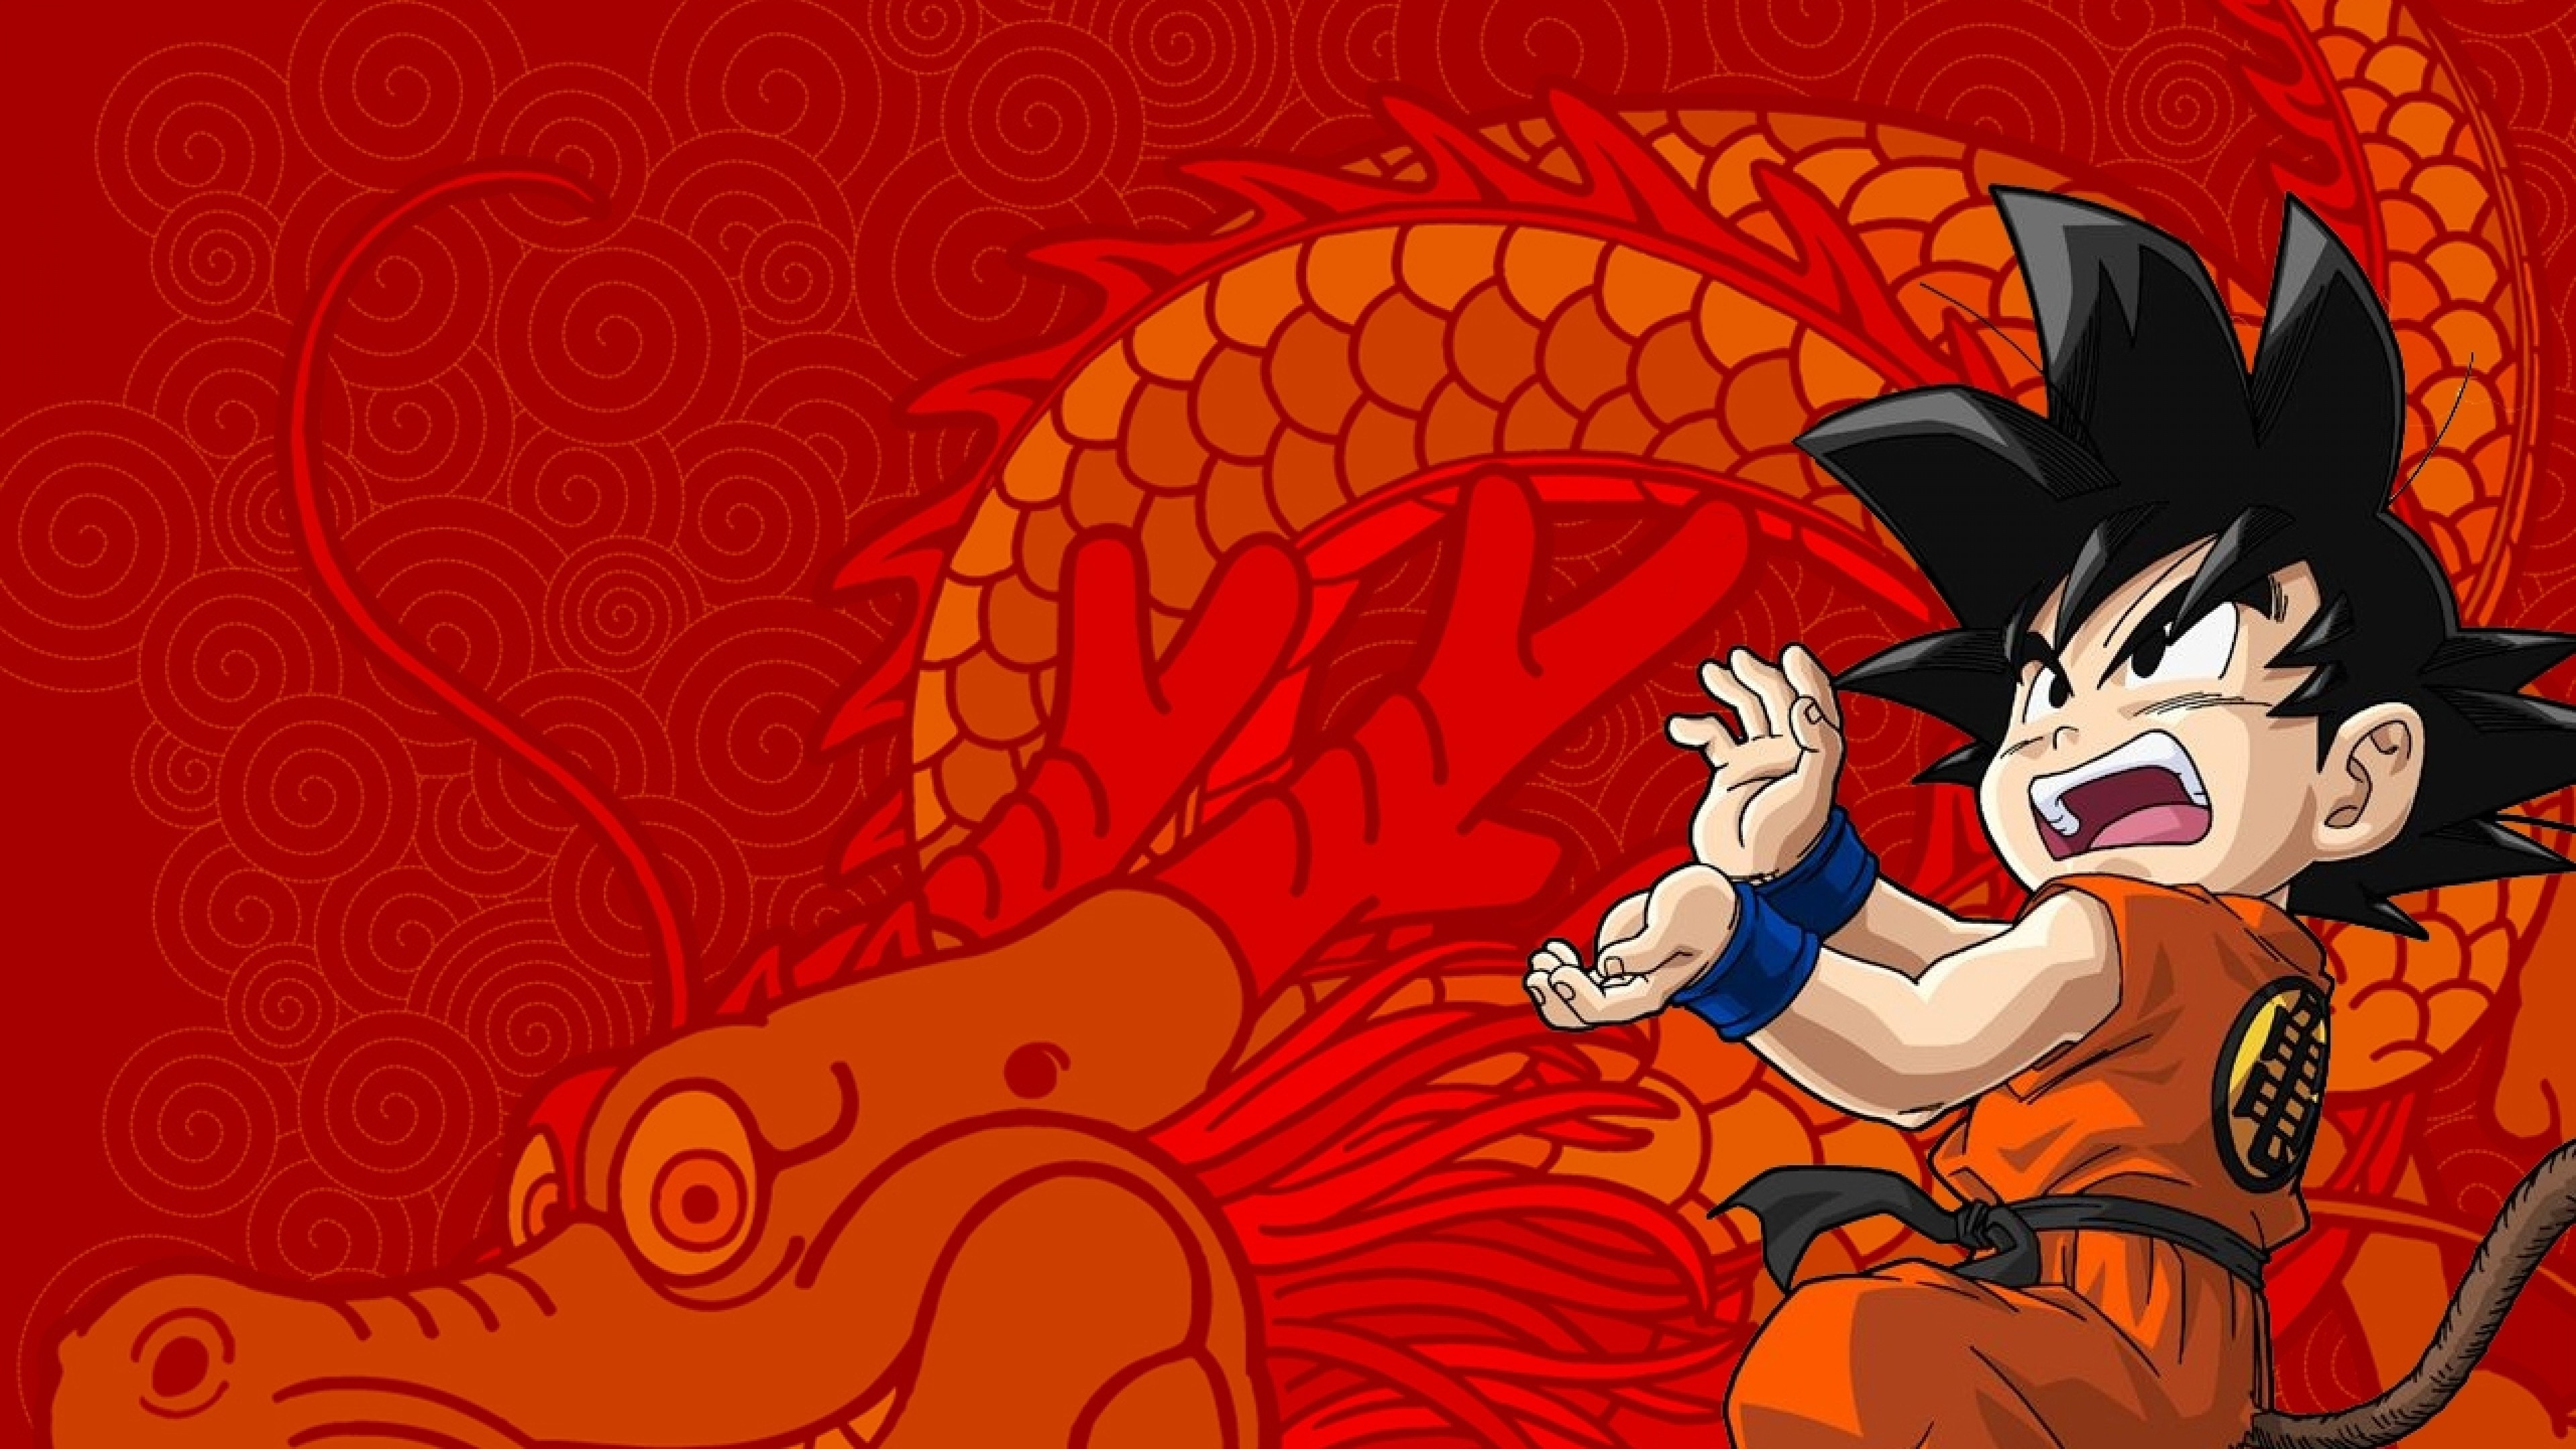 Goku desktop wallpaper free download